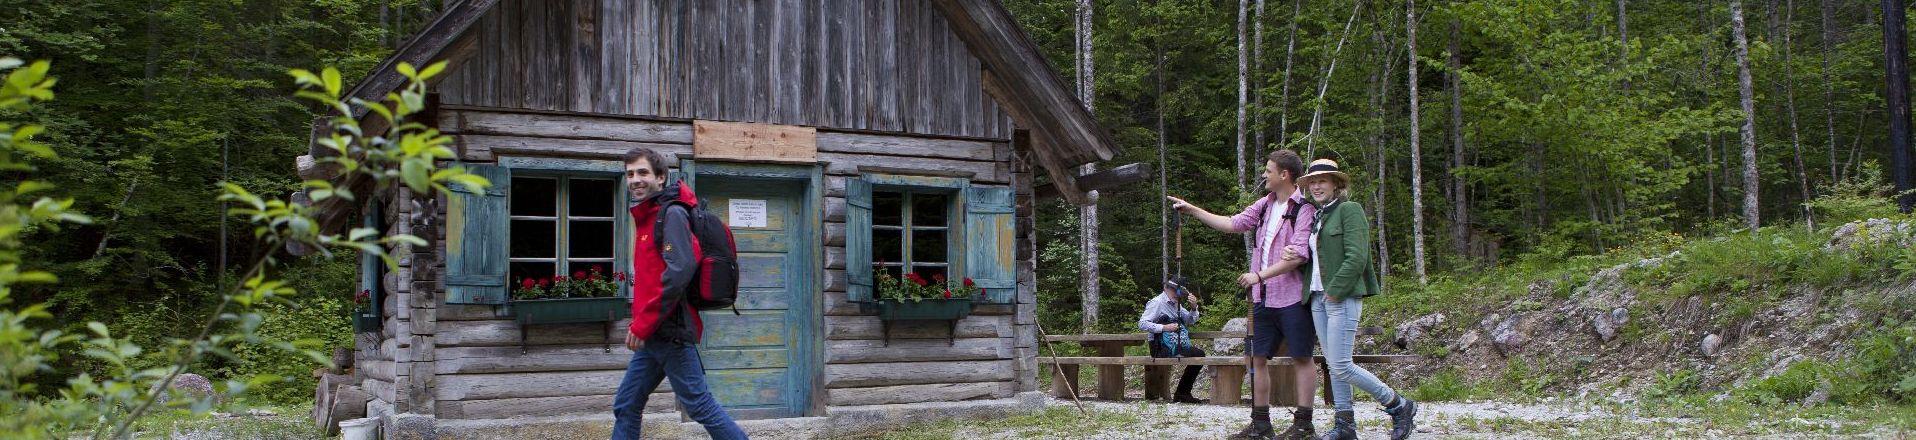 Jagdhütte 1920 x 401